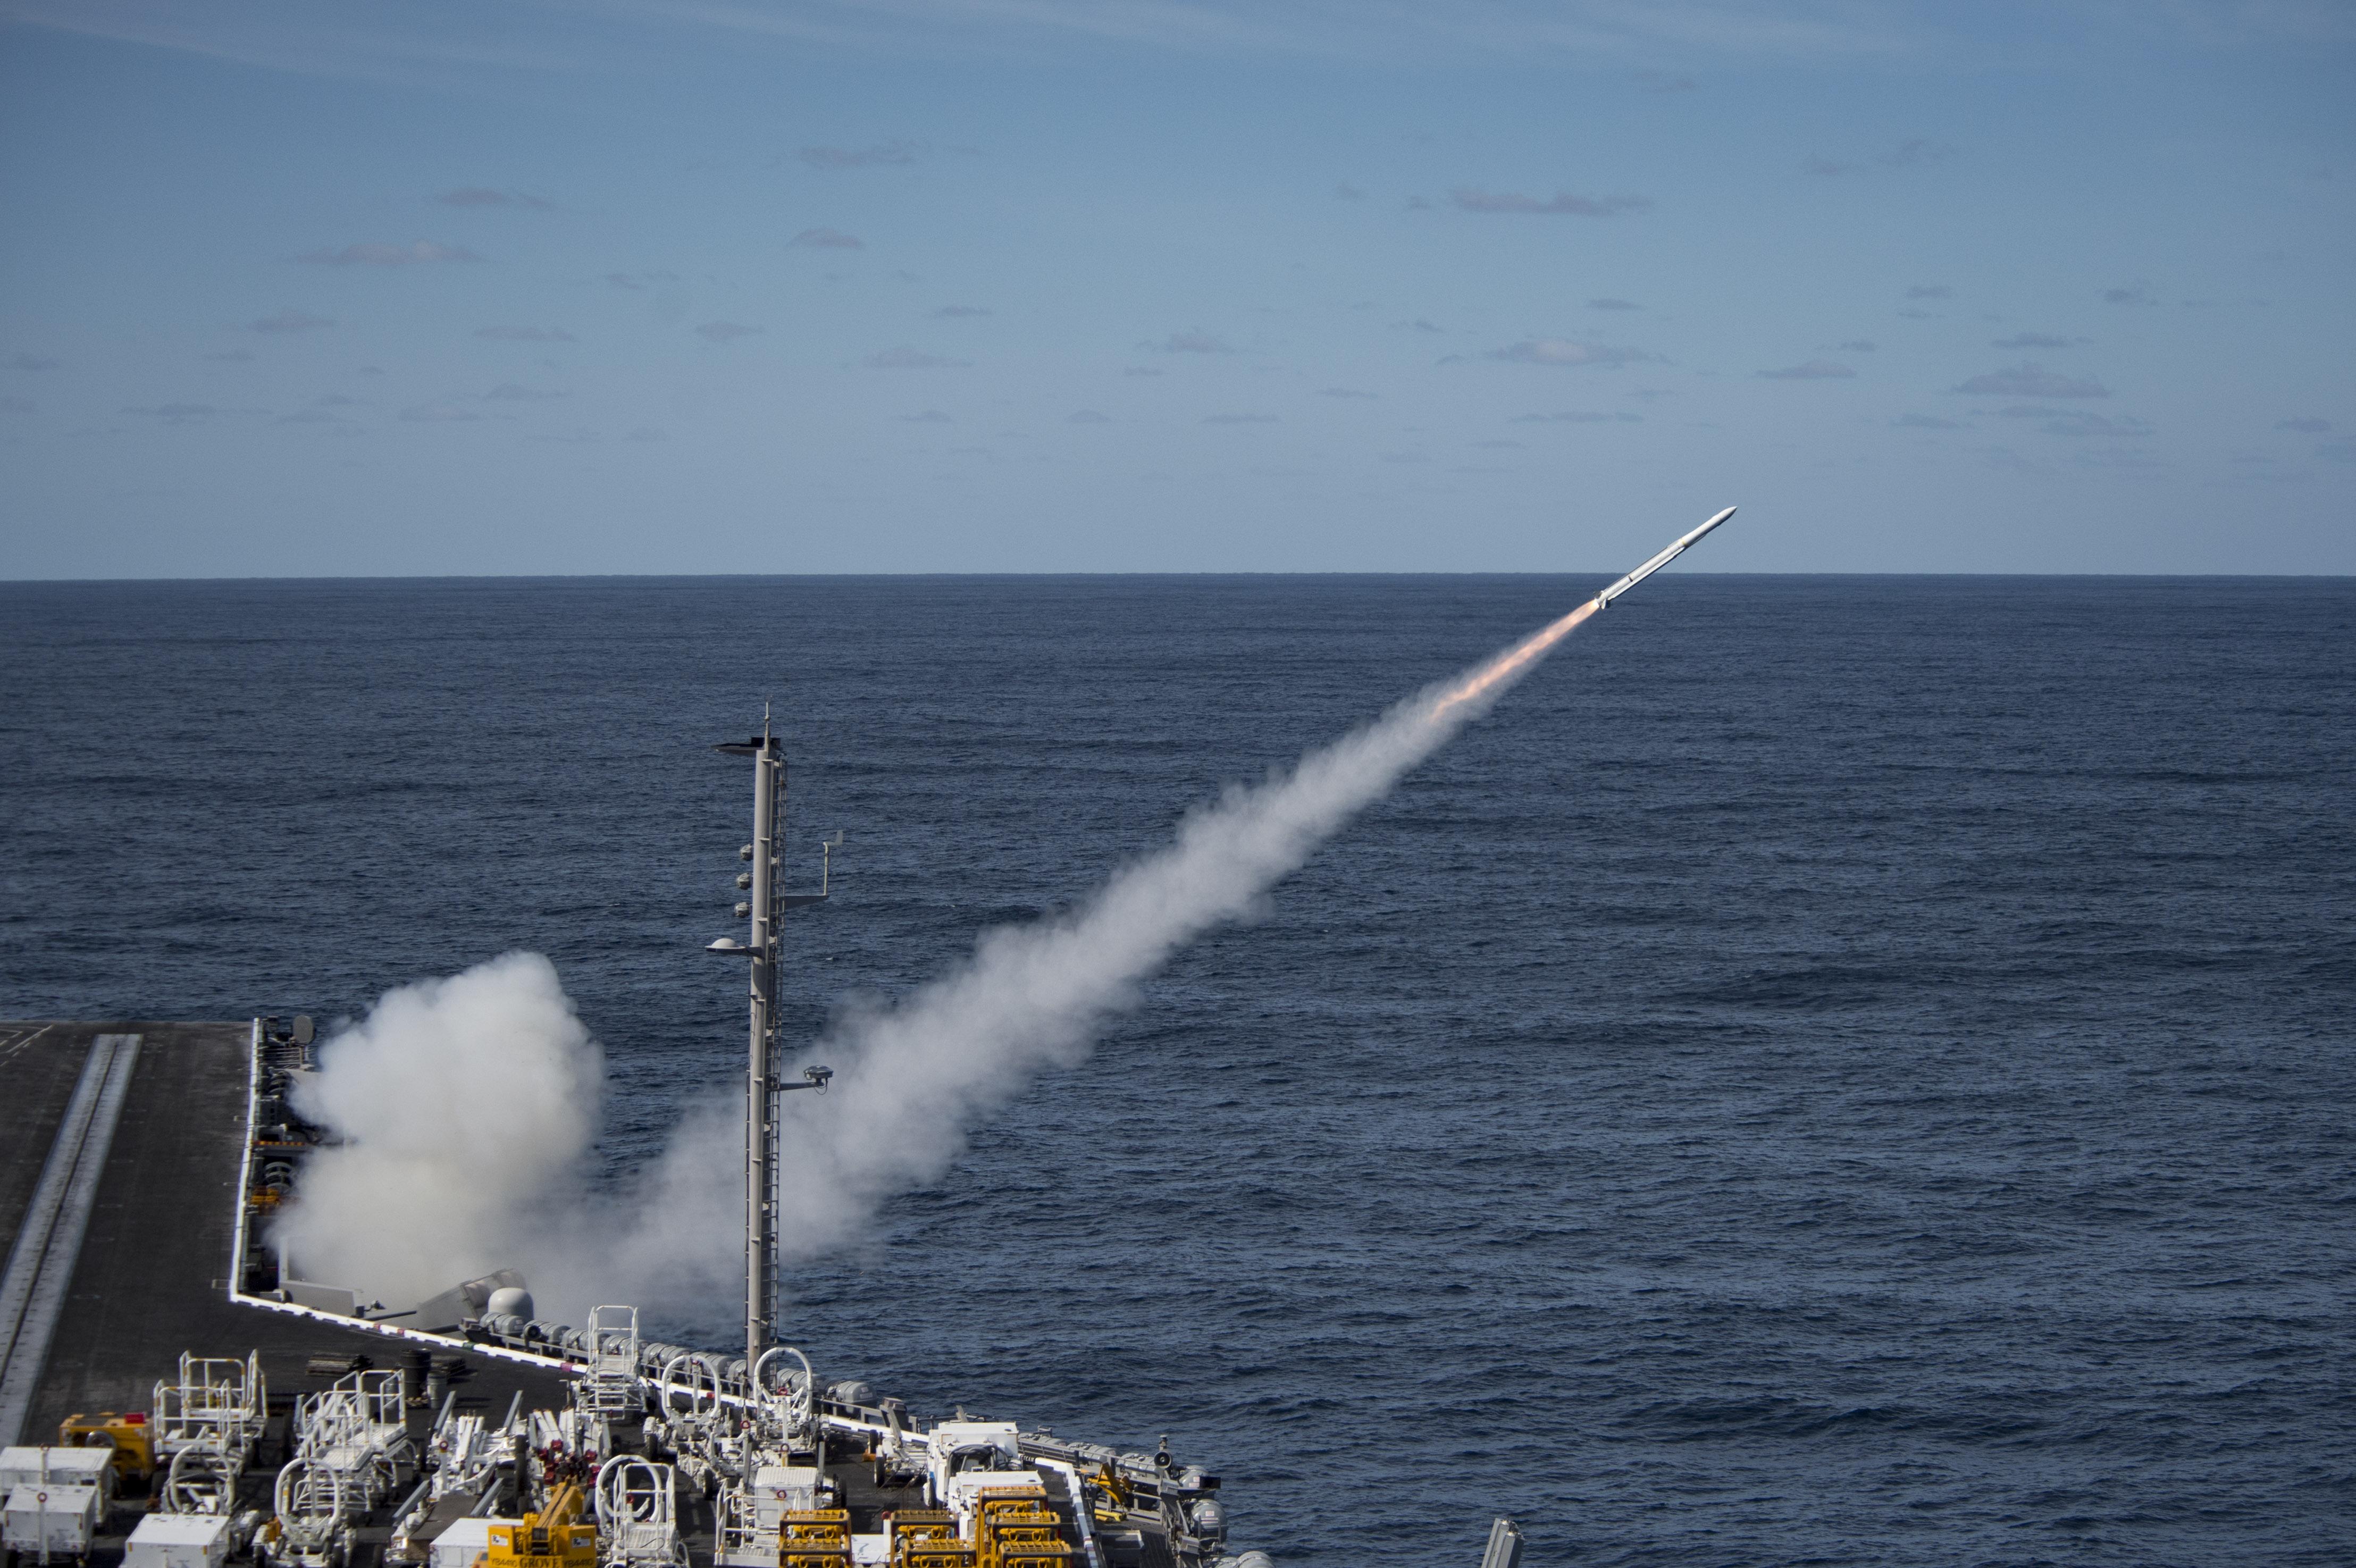 Evolved Seasparrow Missile Block 2 Successfully Intercepts Aerial